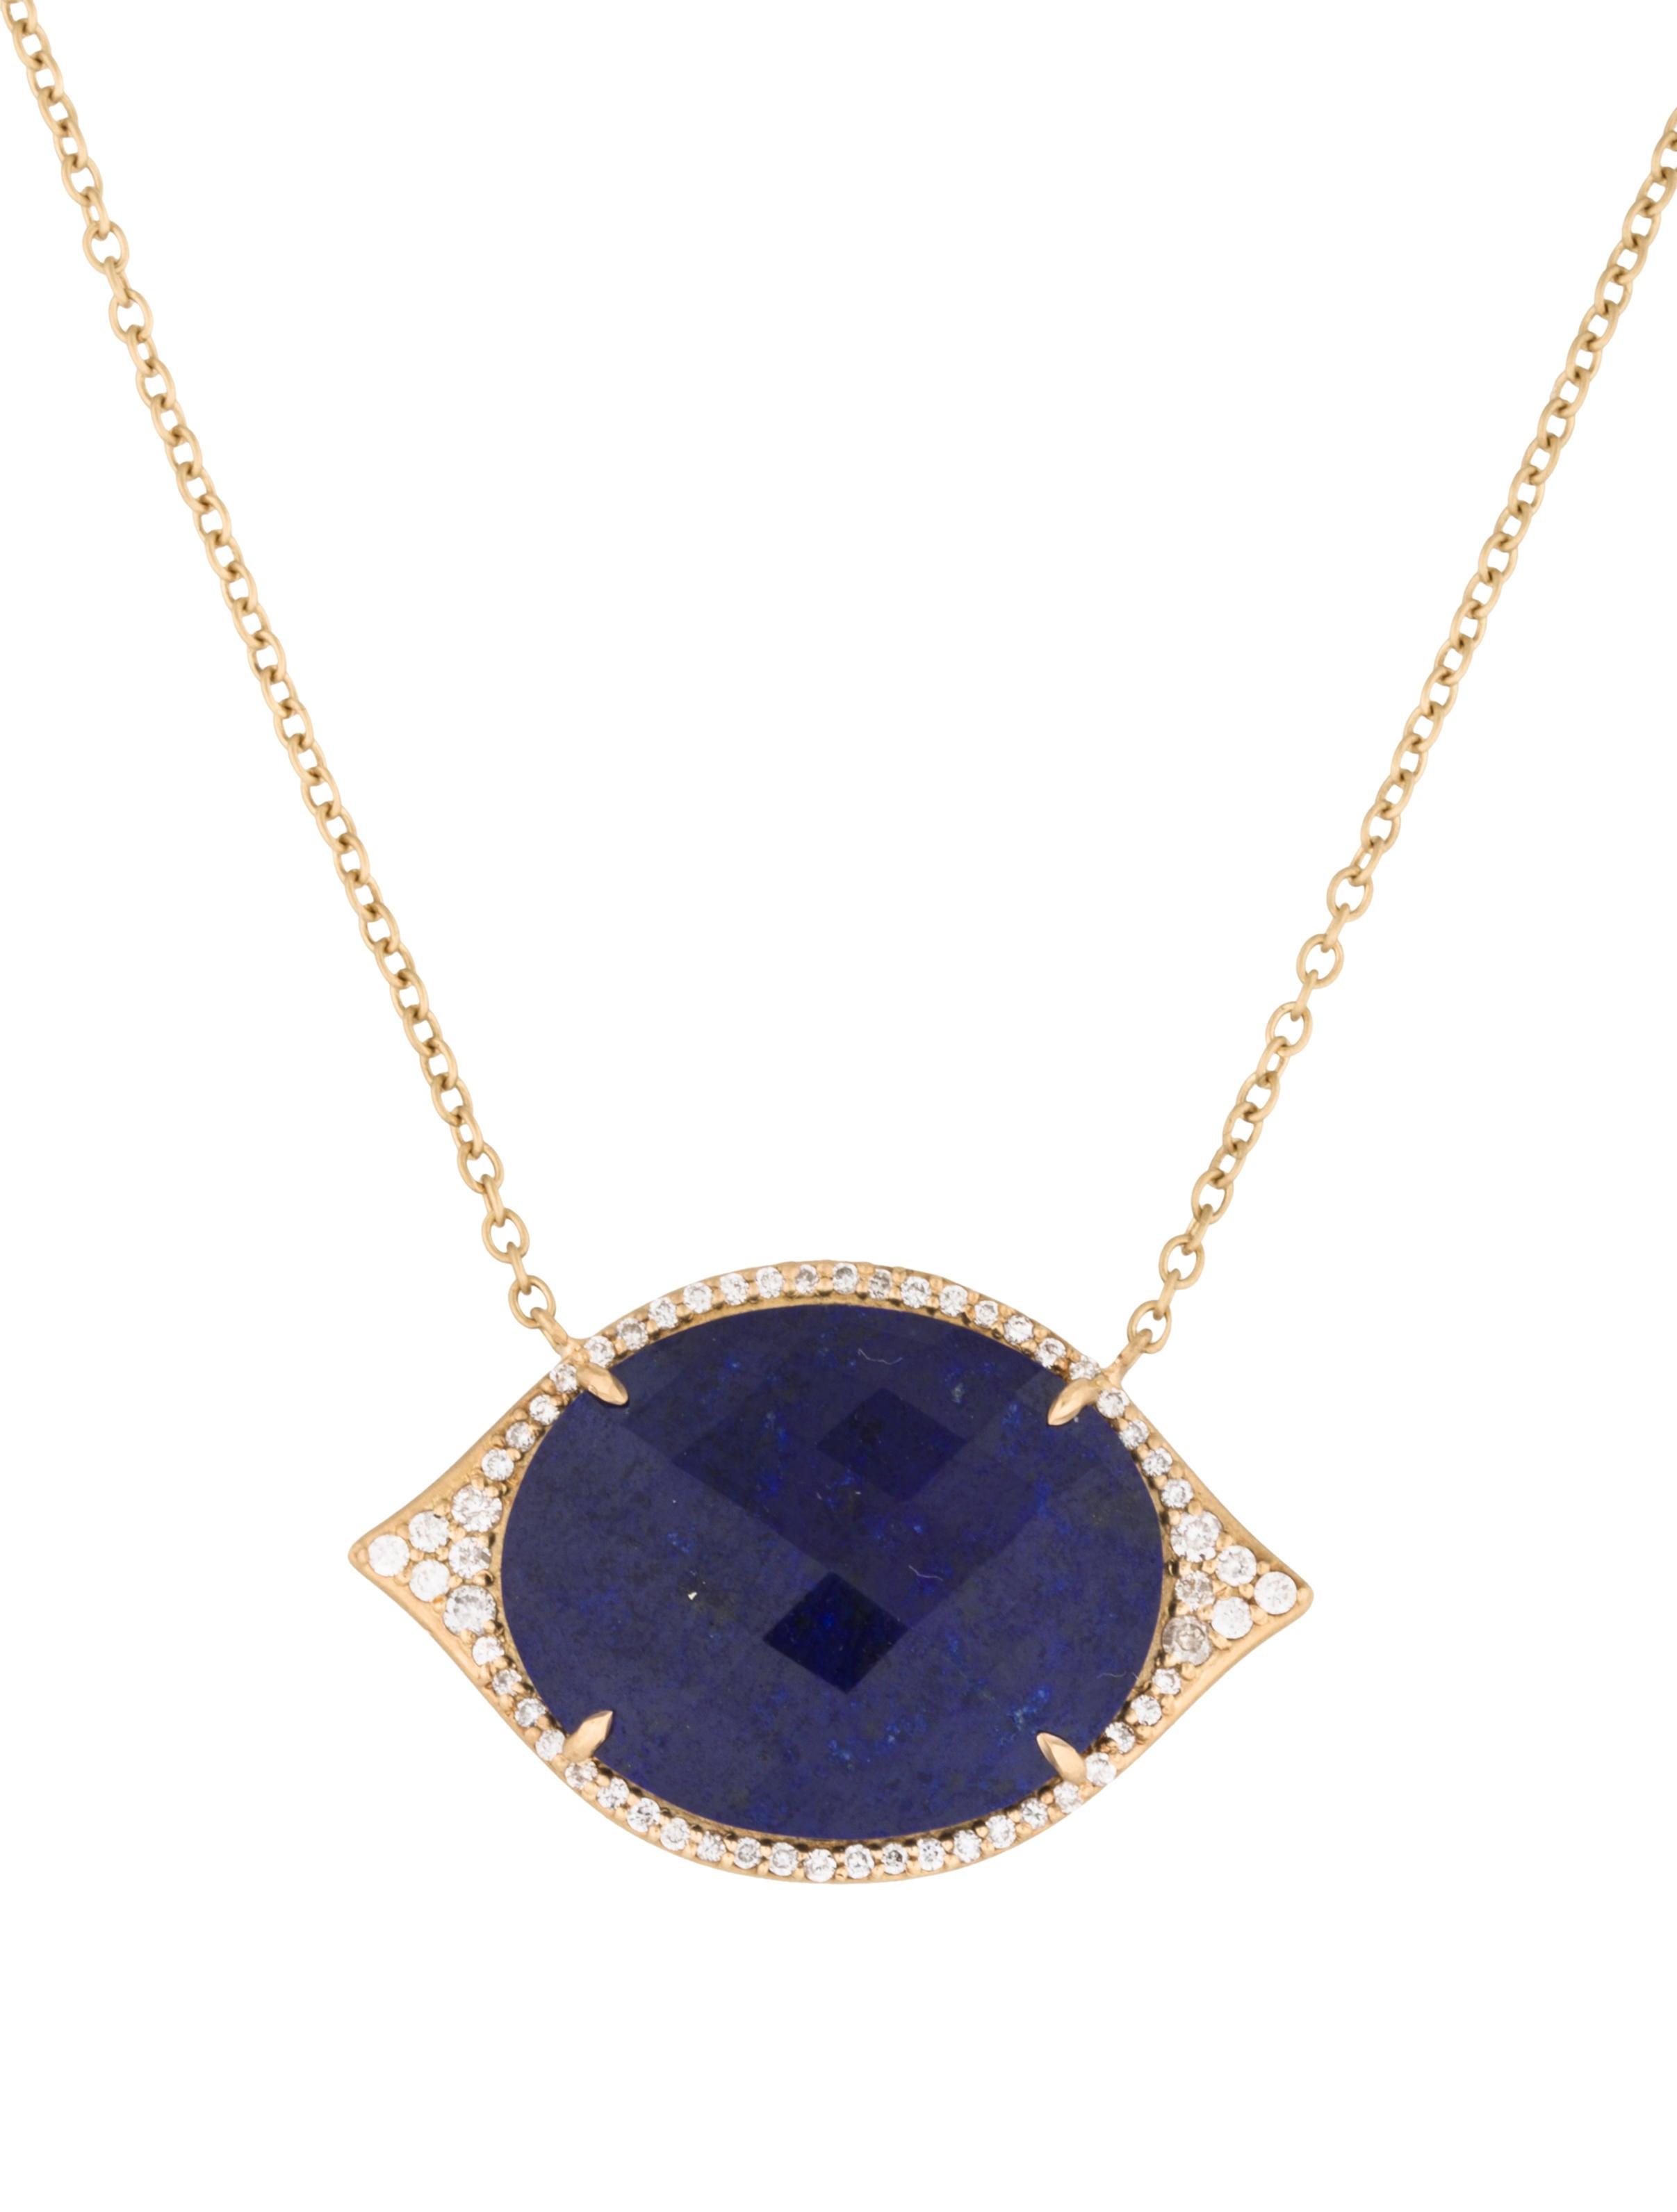 jamie wolf 18k diamond lapis lazuli evil eye necklace. Black Bedroom Furniture Sets. Home Design Ideas